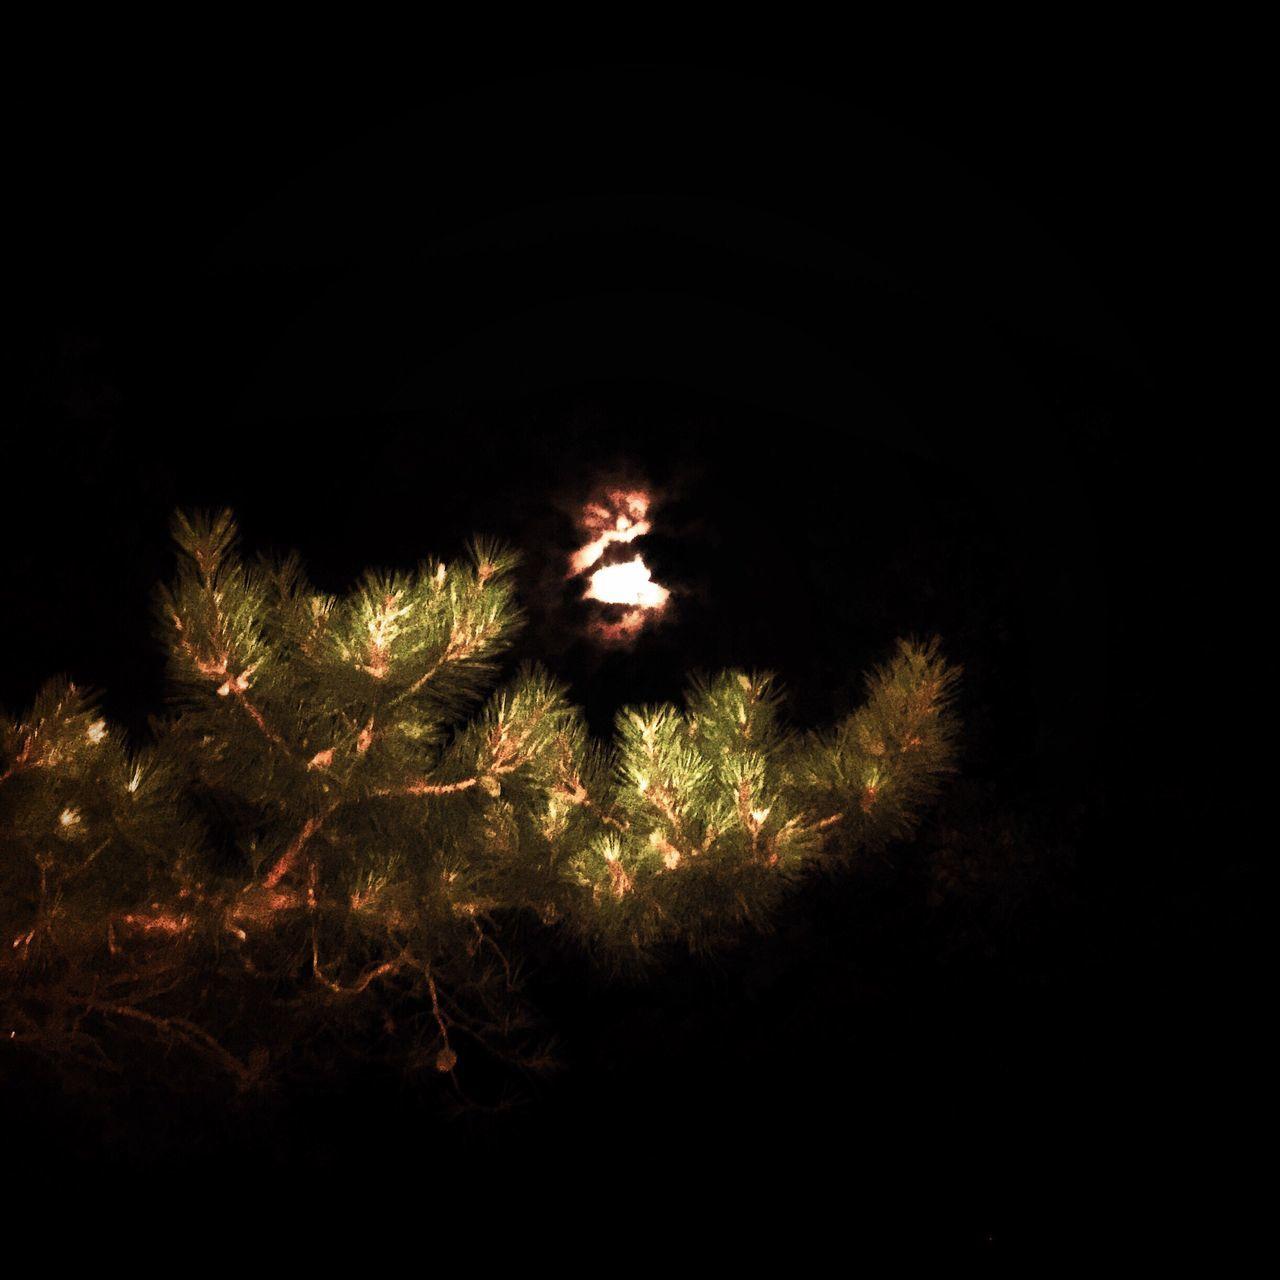 Phoneography Cape Cod Wellfleet Night Flash Tree Pine Trees